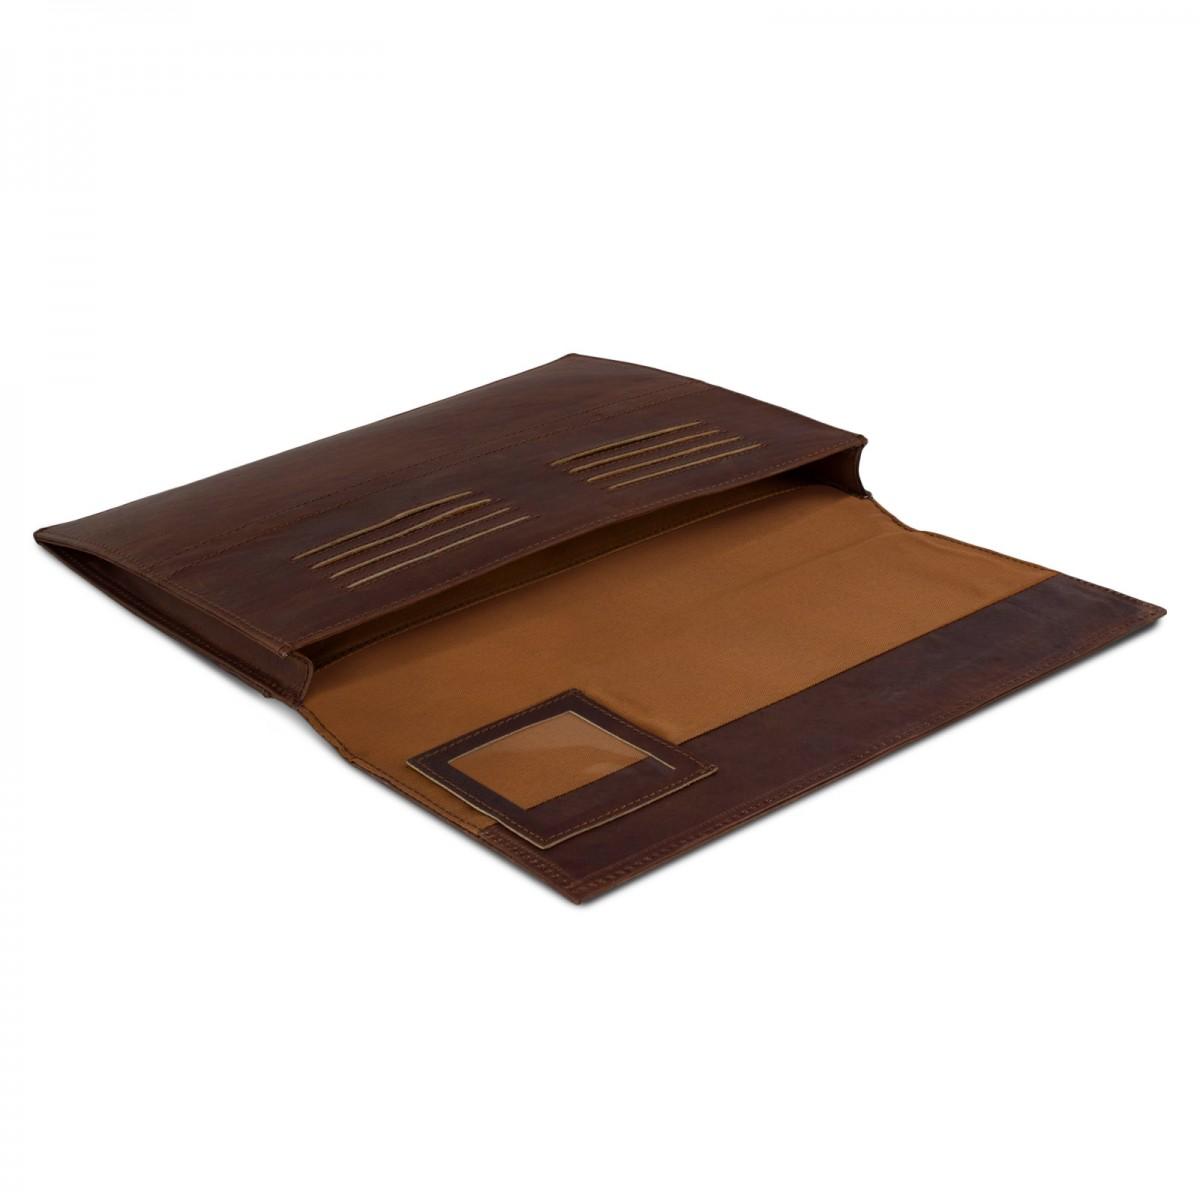 royalz ledertasche f r microsoft surface laptop tasche. Black Bedroom Furniture Sets. Home Design Ideas